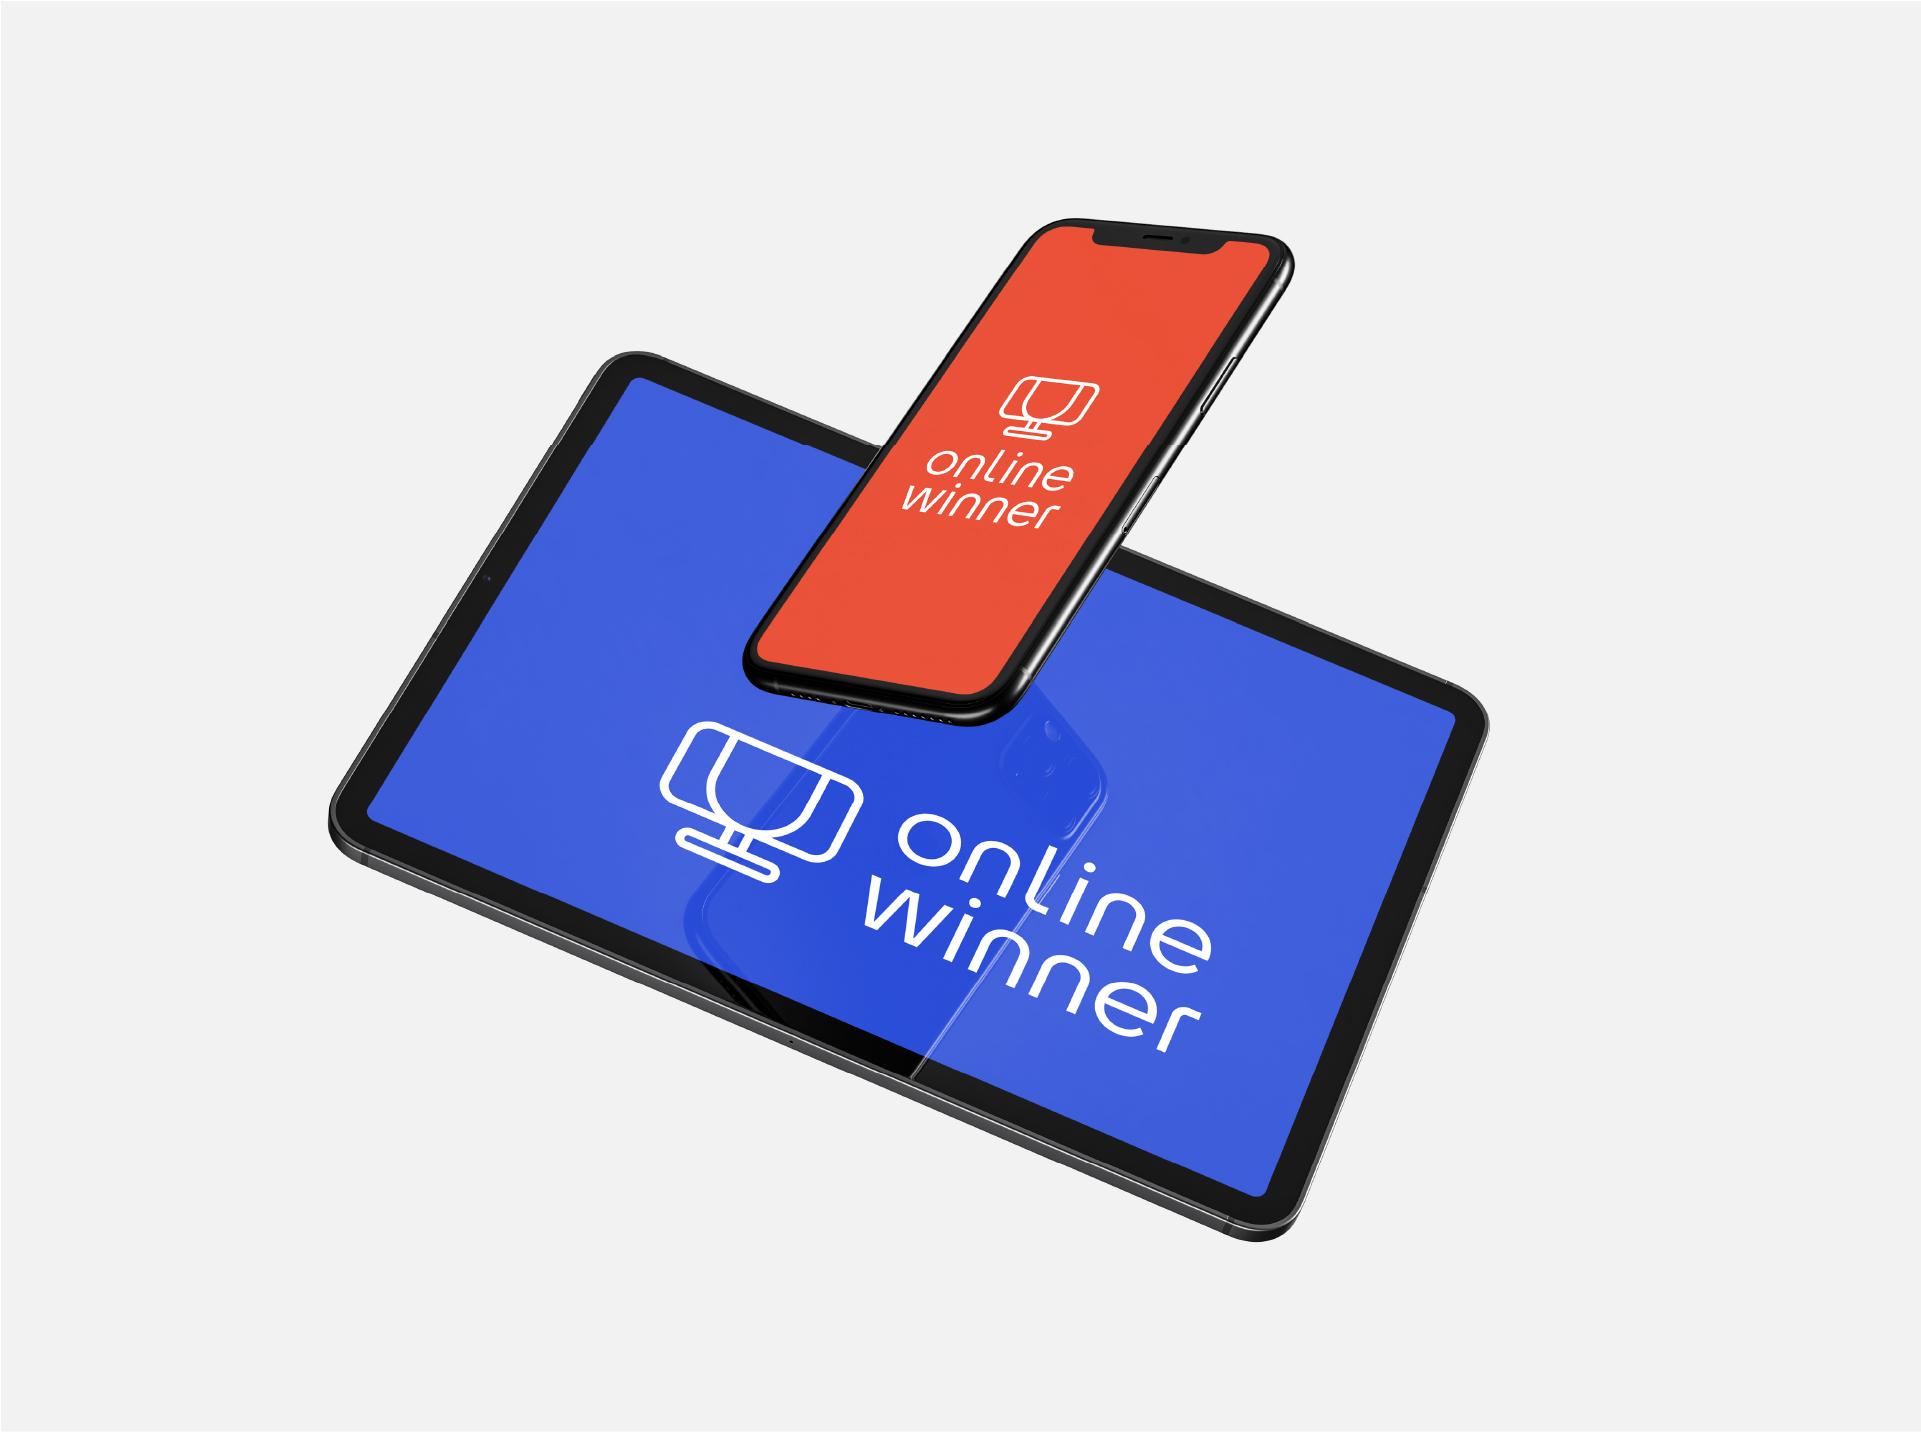 Online Winner